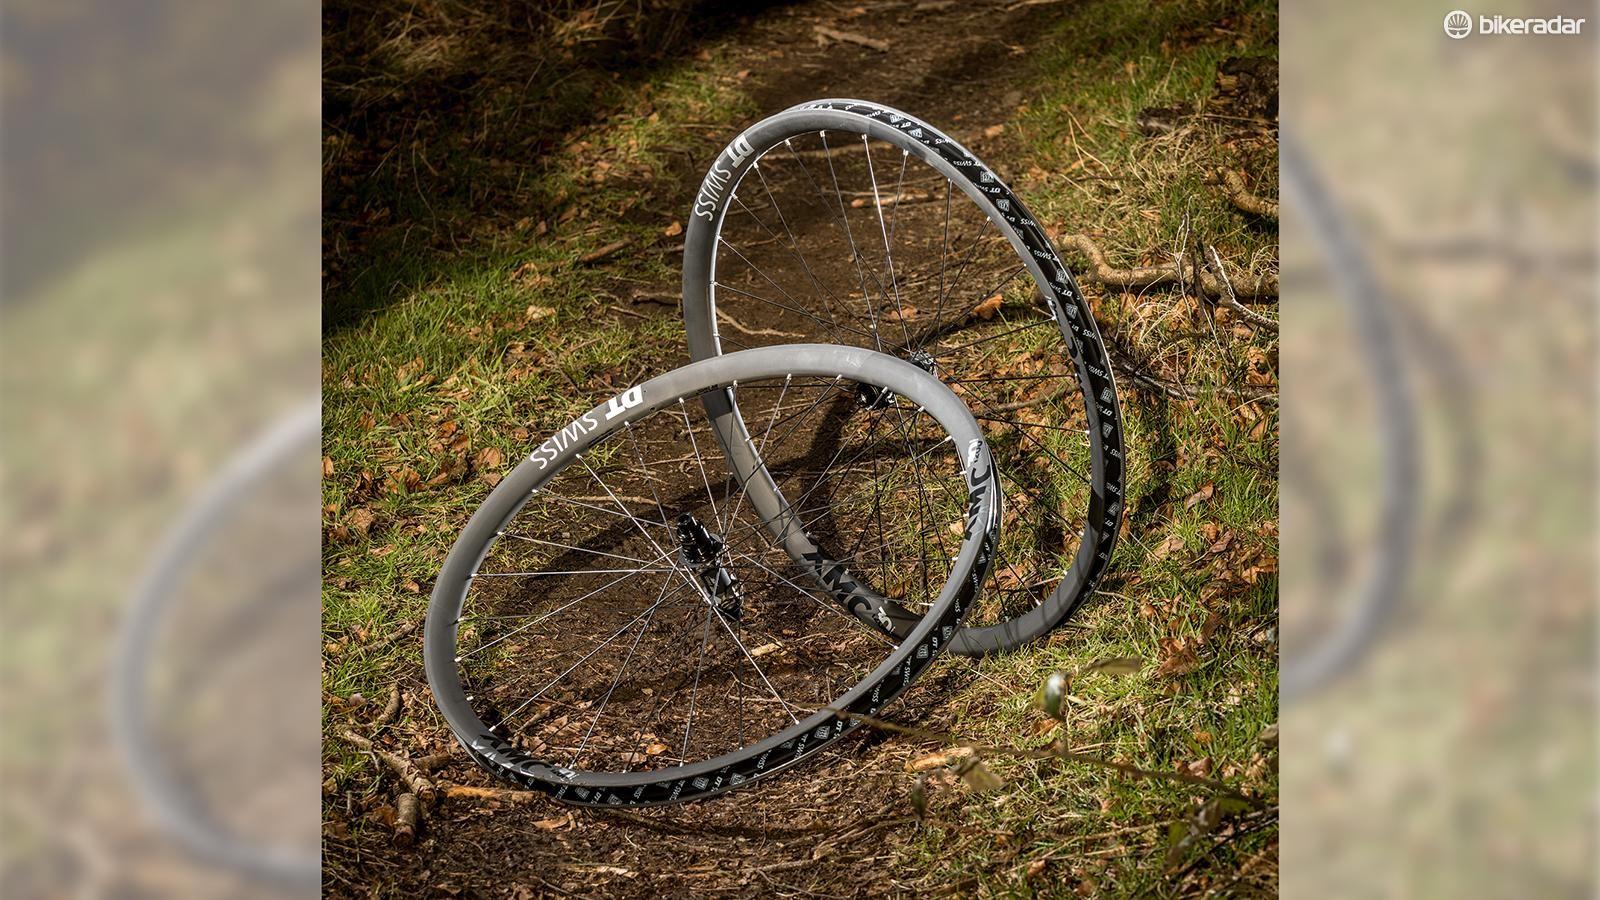 DT Swiss's XRC 1200 SPLINE 30 wheelset